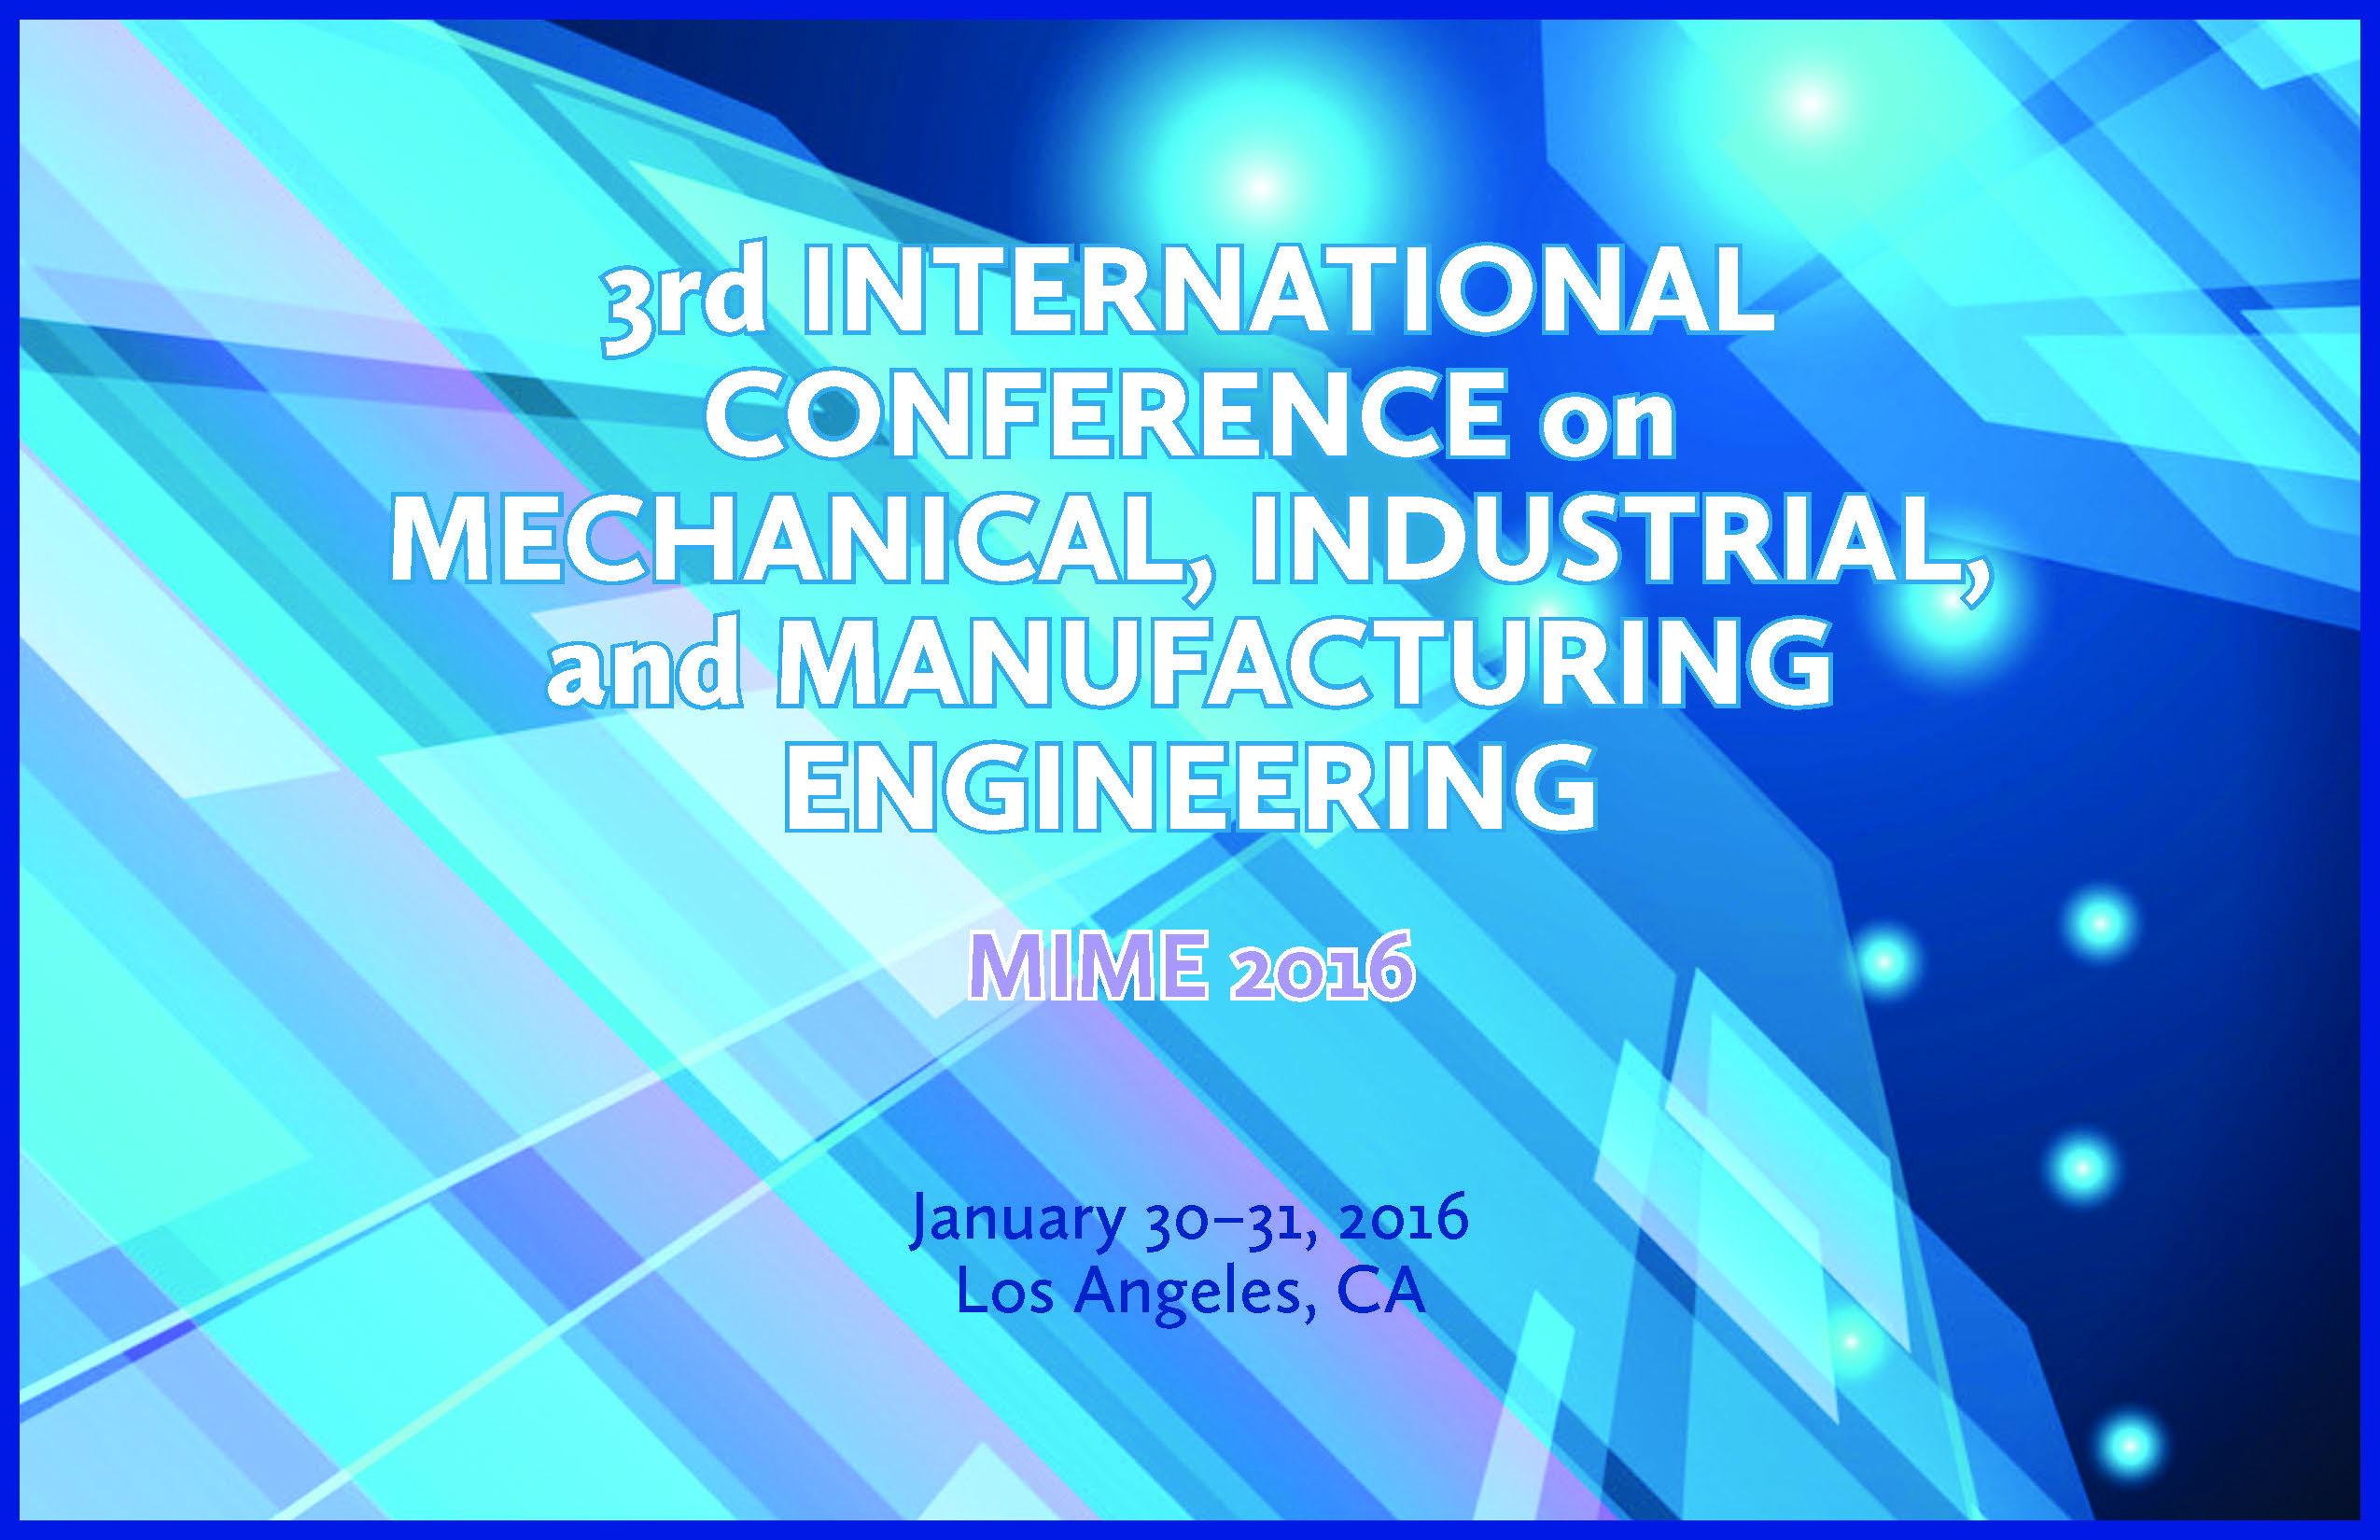 MIME 2016 3rd International Conference | DEStech Publications